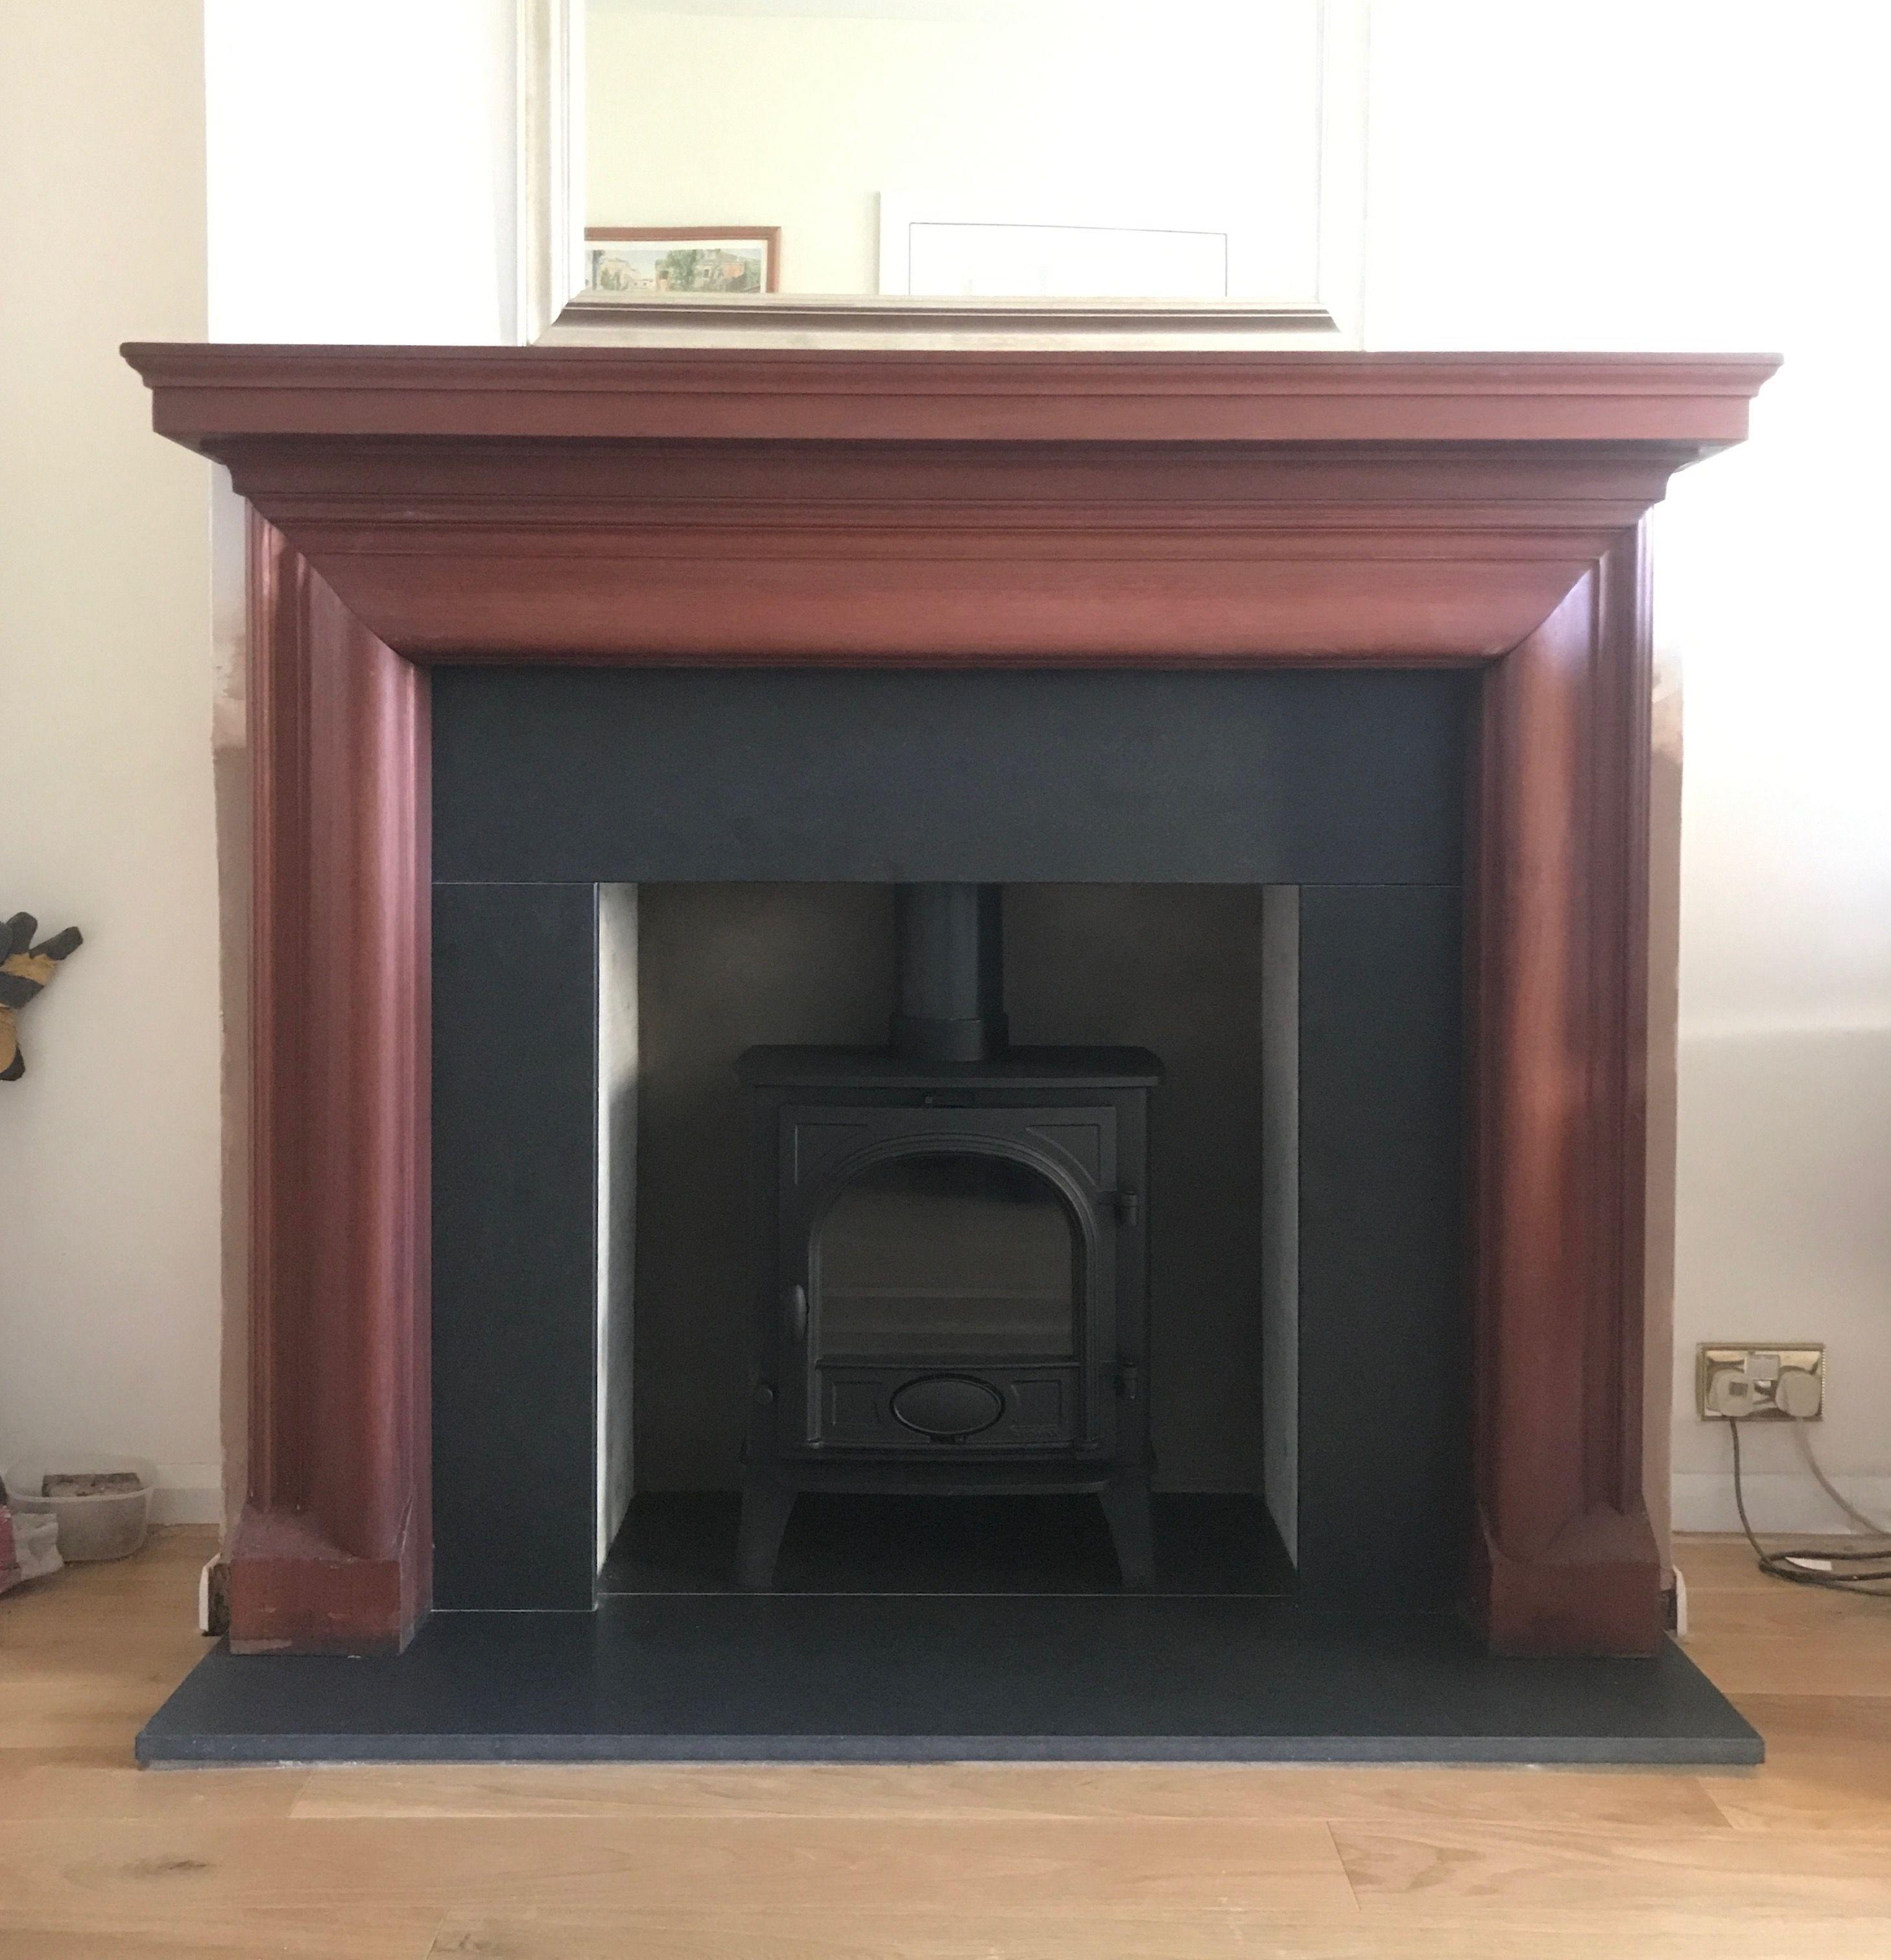 Wooden Fire Surround With Honed Granite Hearth And Slip Set Stovax Stockton 5 Multi Fuel Stove Wooden Fire Surrounds Multi Fuel Stove Granite Hearth